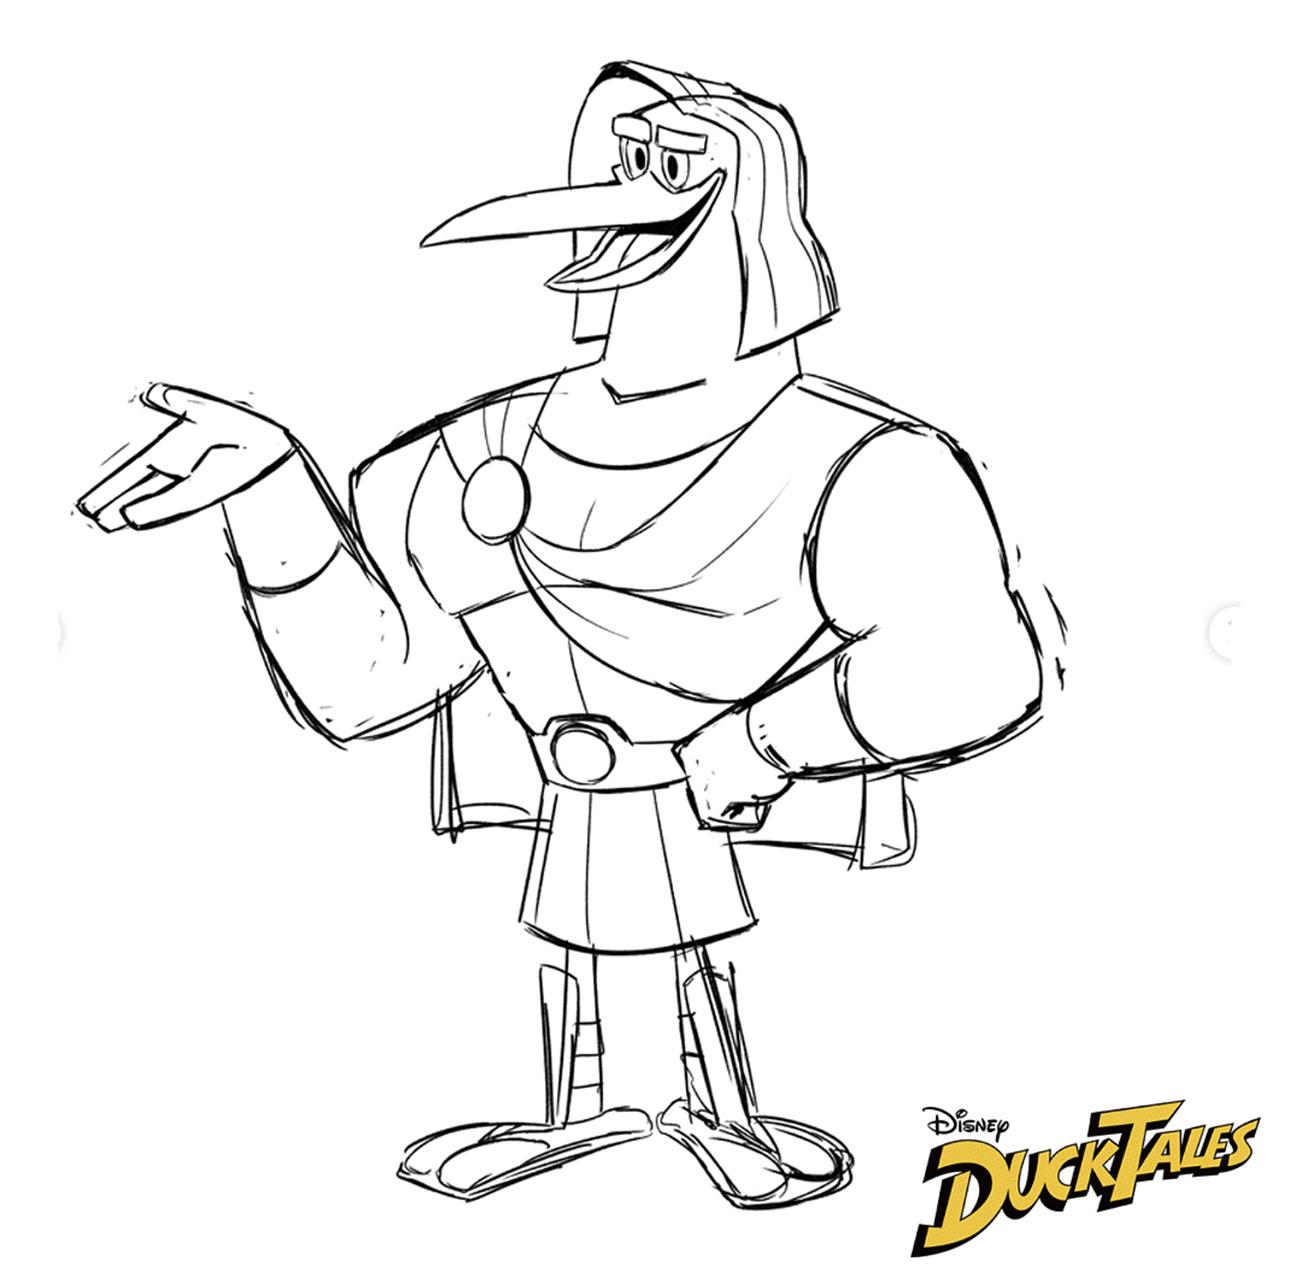 DuckTalesNew - 68.jpg